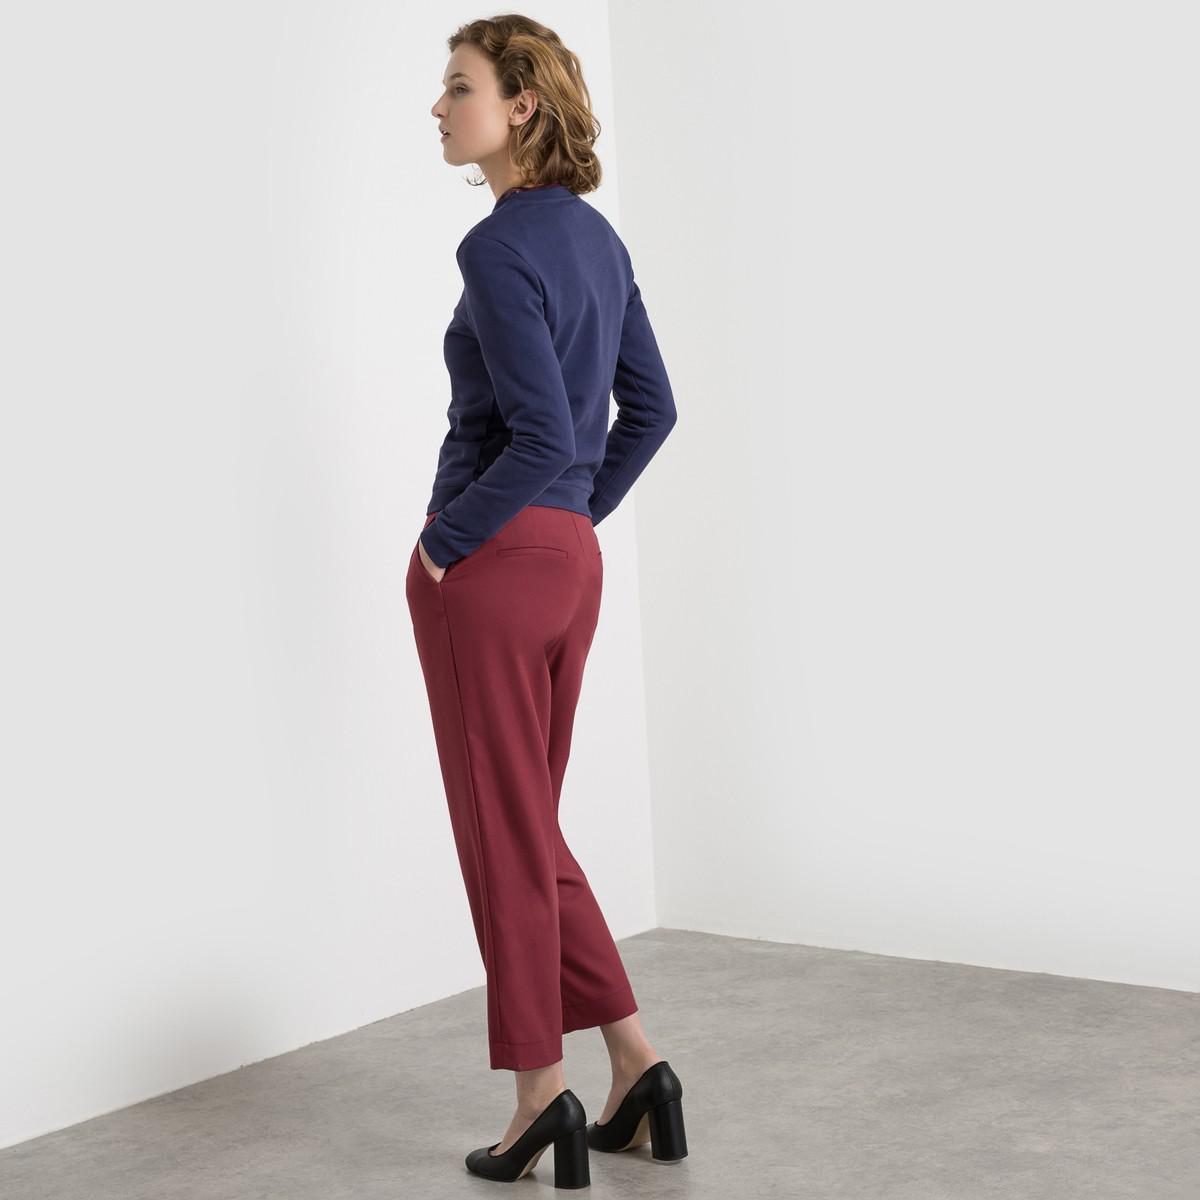 lyst la redoute made in france slogan sweatshirt in blue. Black Bedroom Furniture Sets. Home Design Ideas